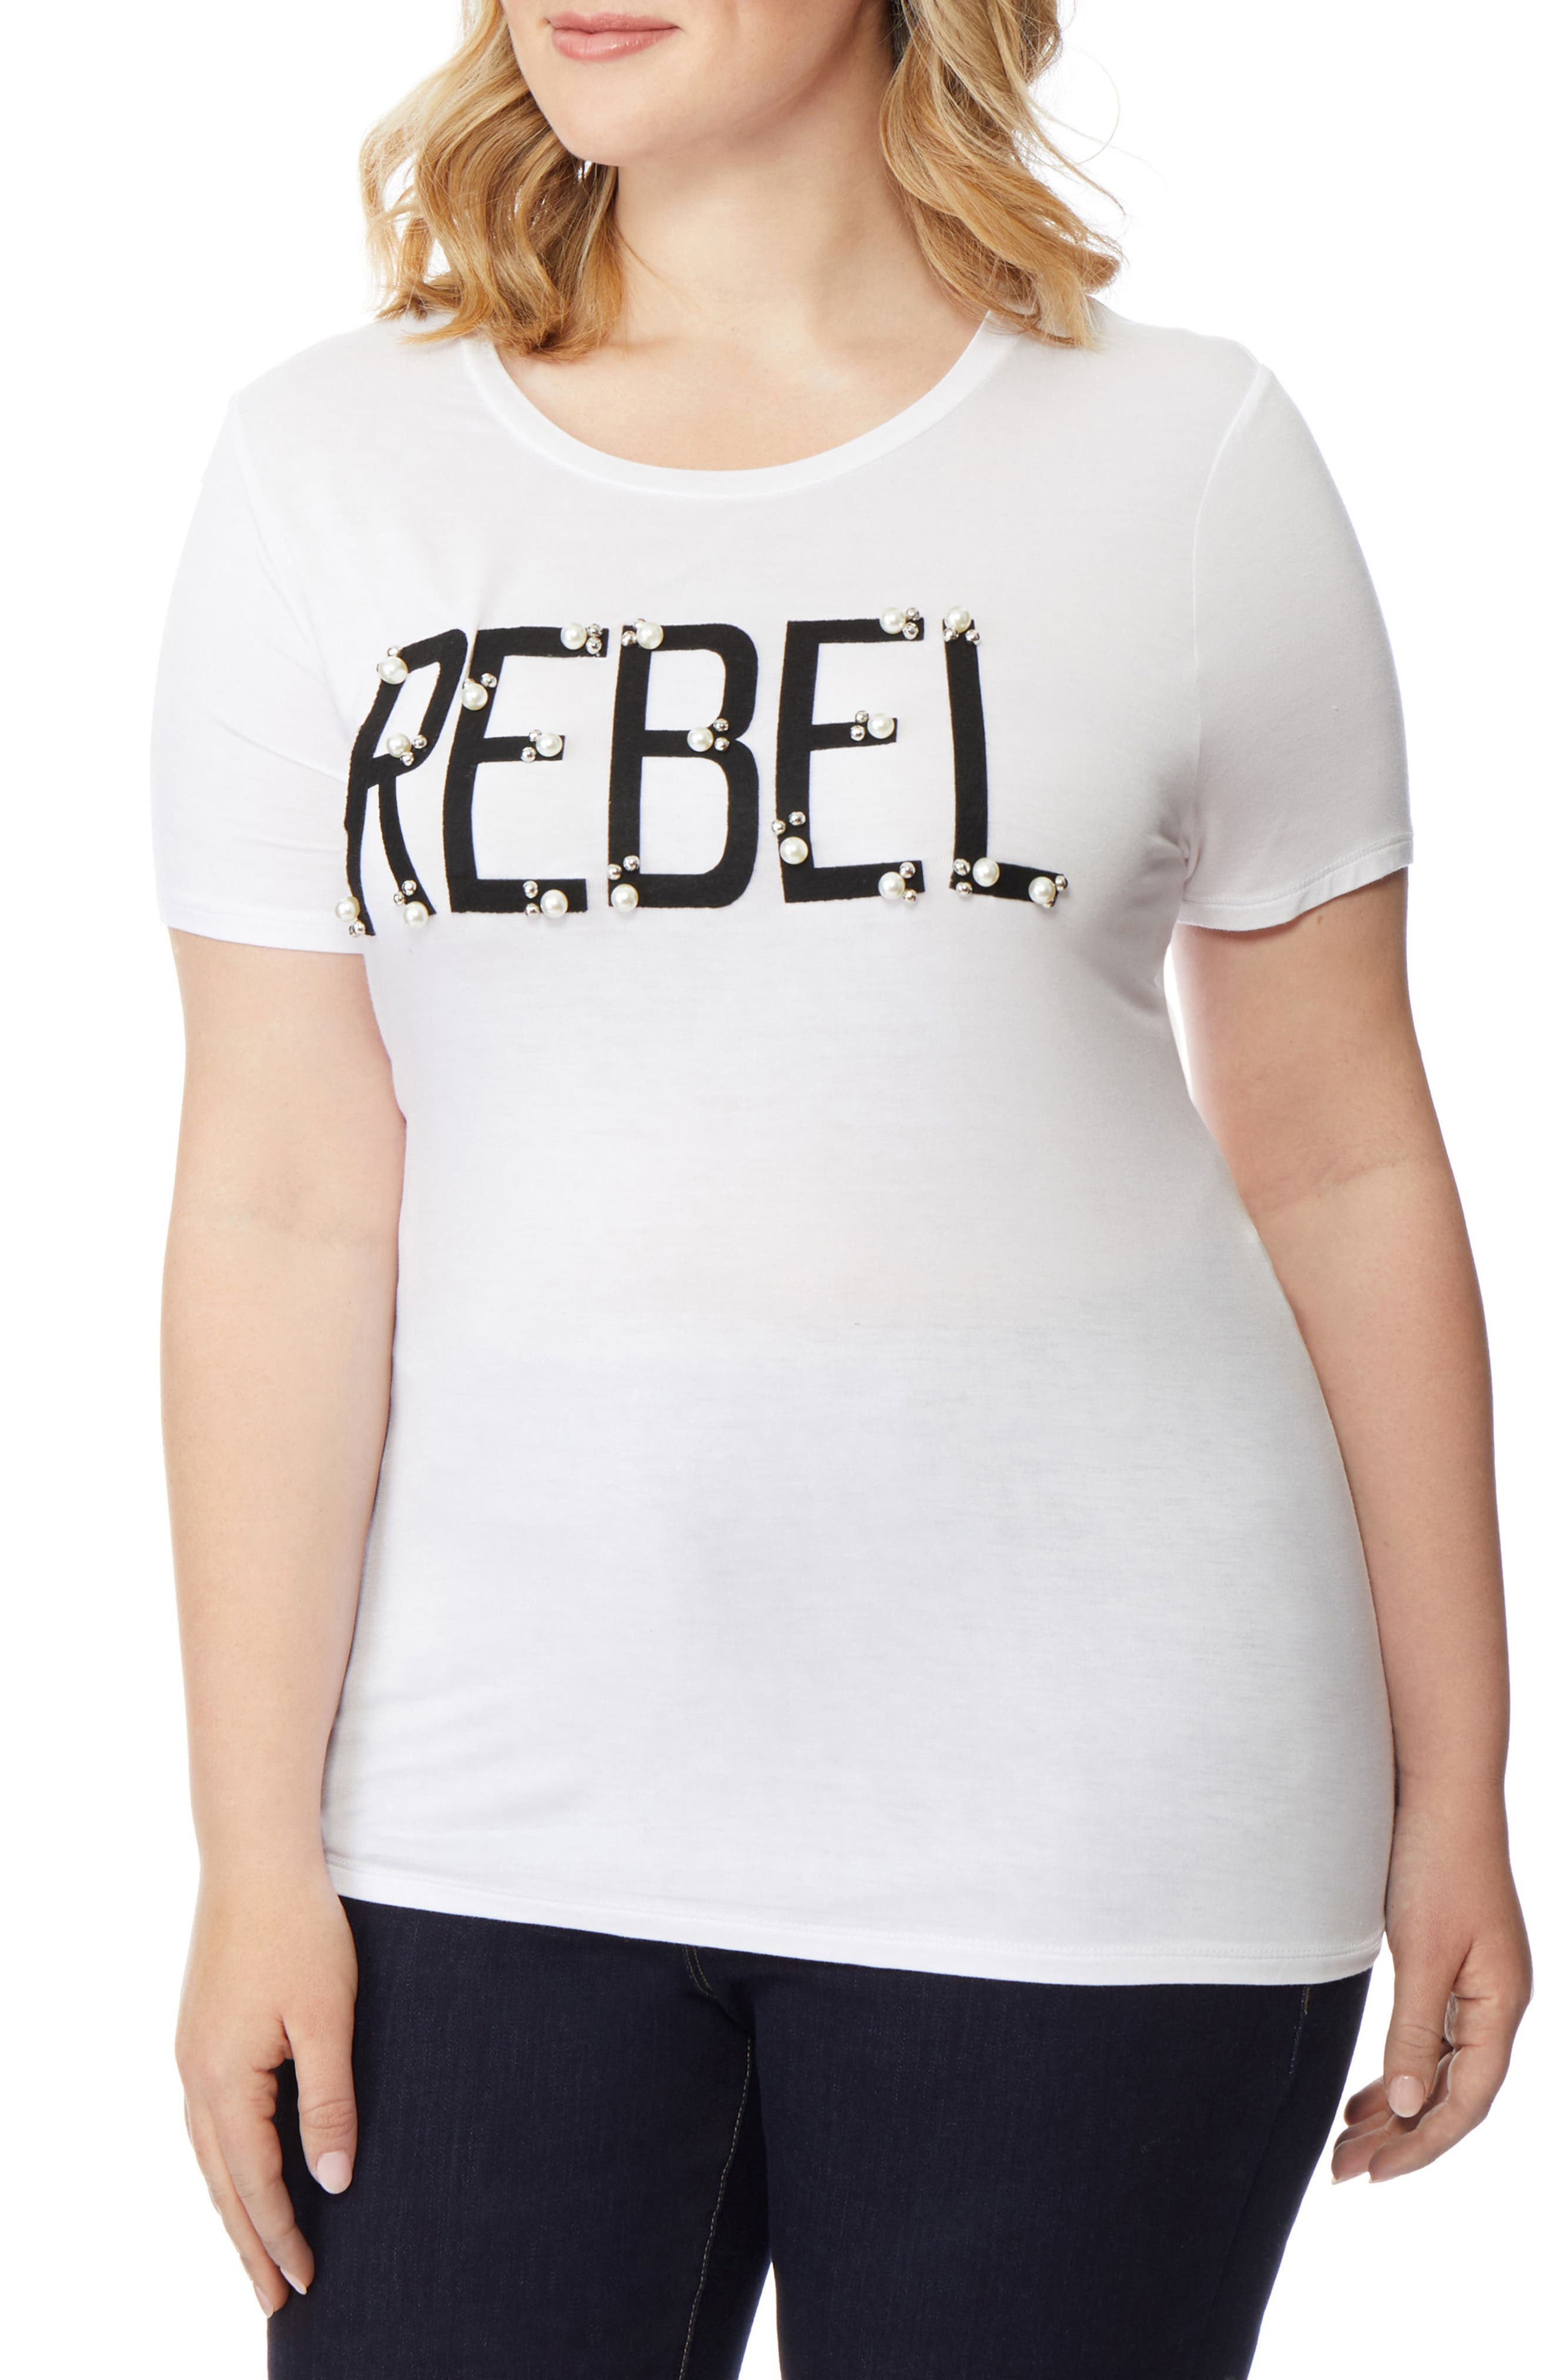 REBEL WILSON X ANGELS, Rebel Embellished Graphic Tee, Alternate thumbnail 3, color, 107